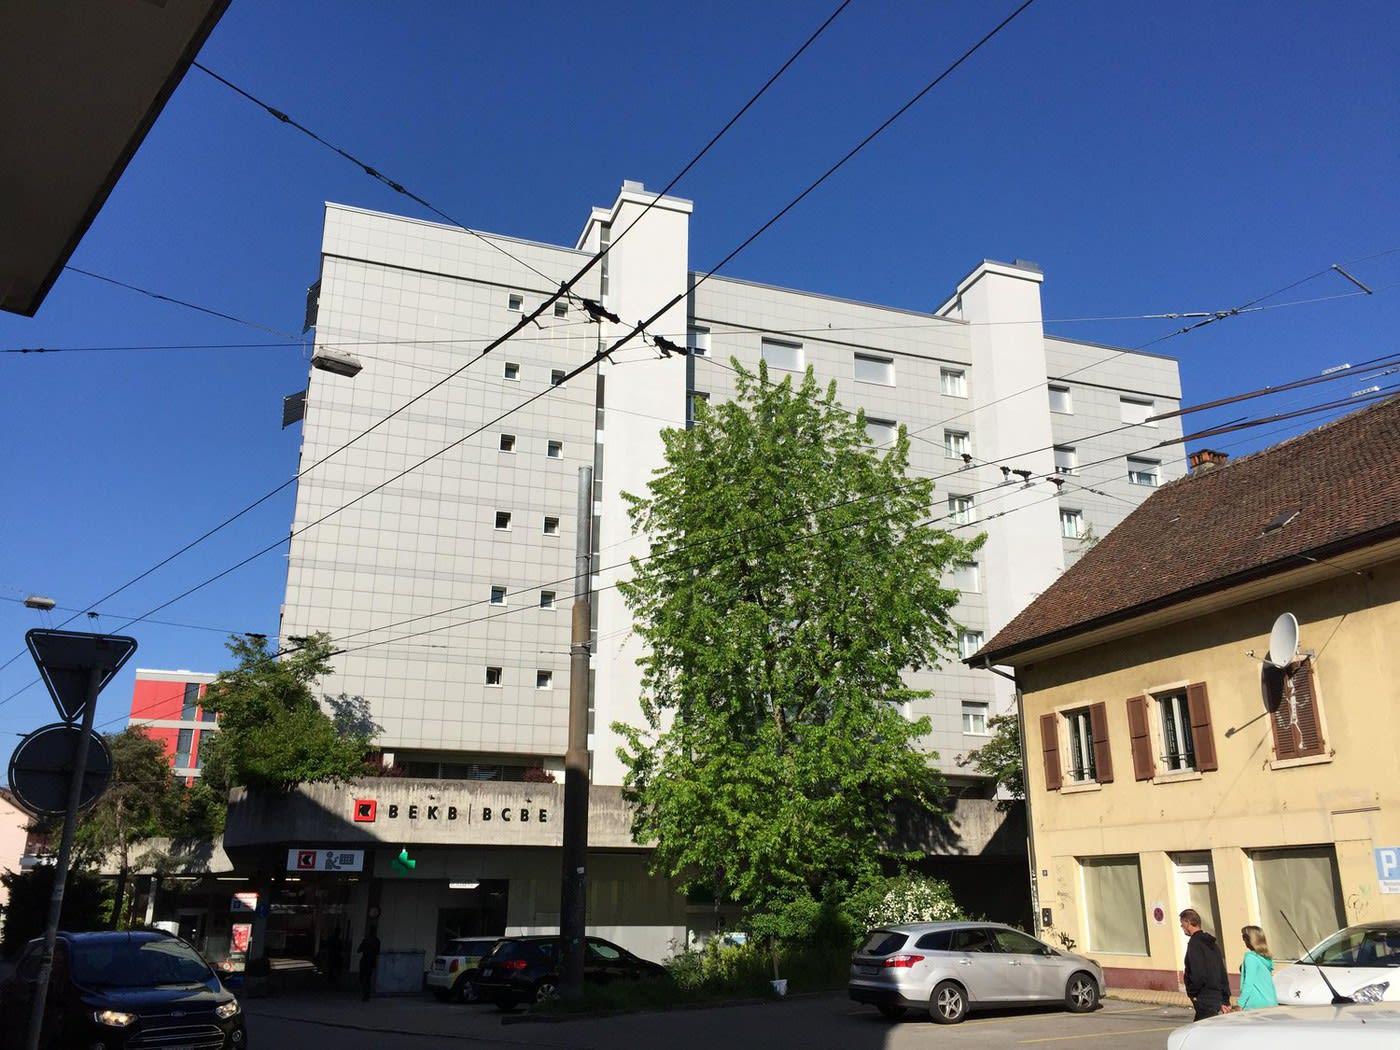 Poststrasse 17a